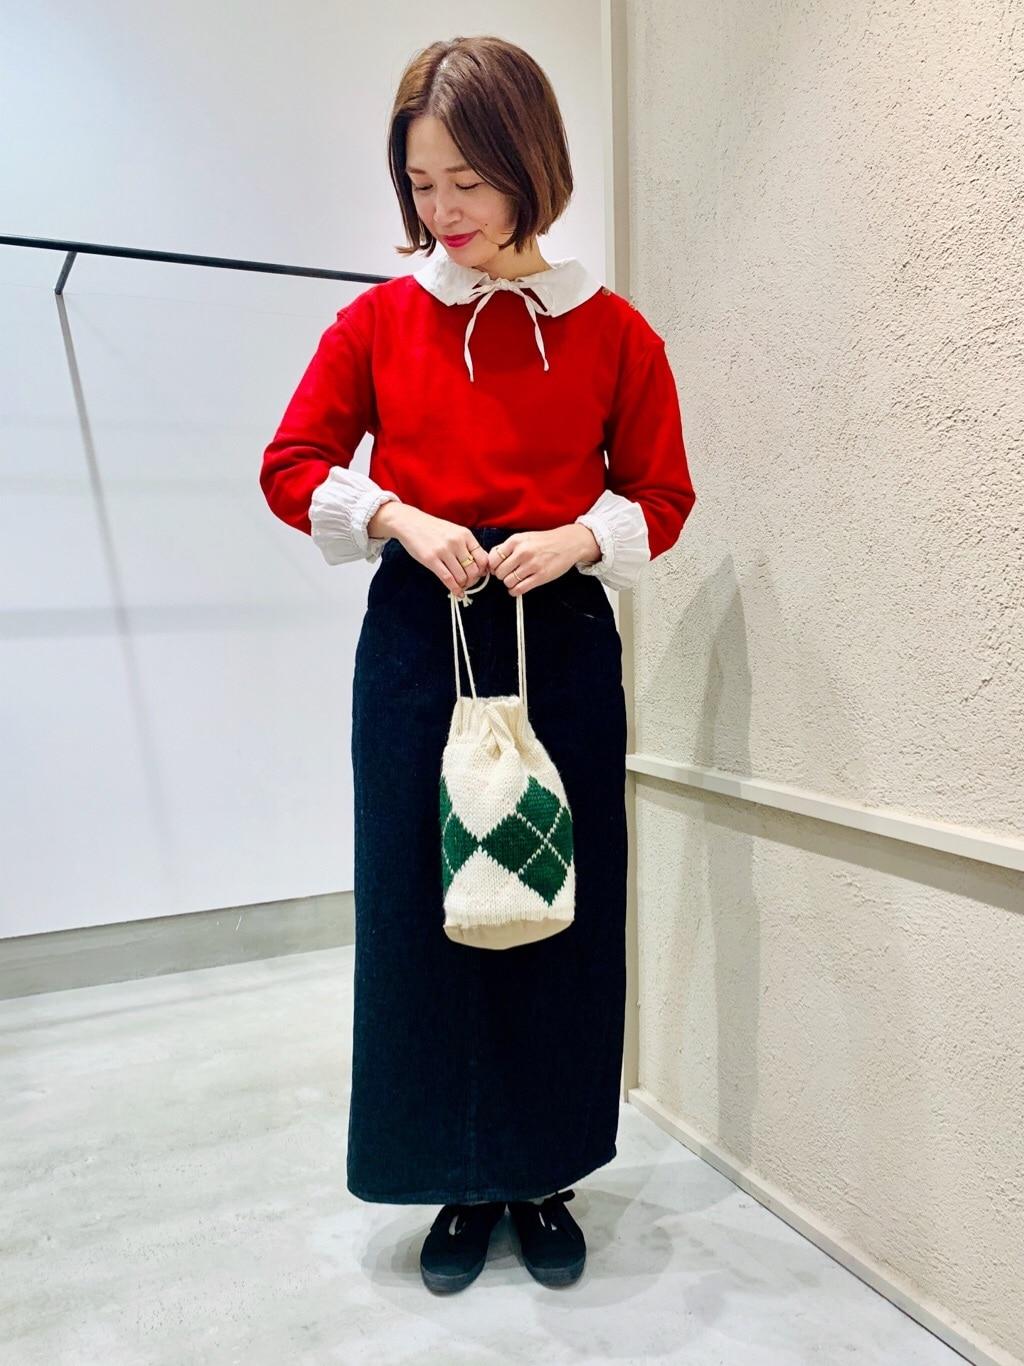 chambre de charme 横浜ジョイナス 身長:160cm 2020.12.20